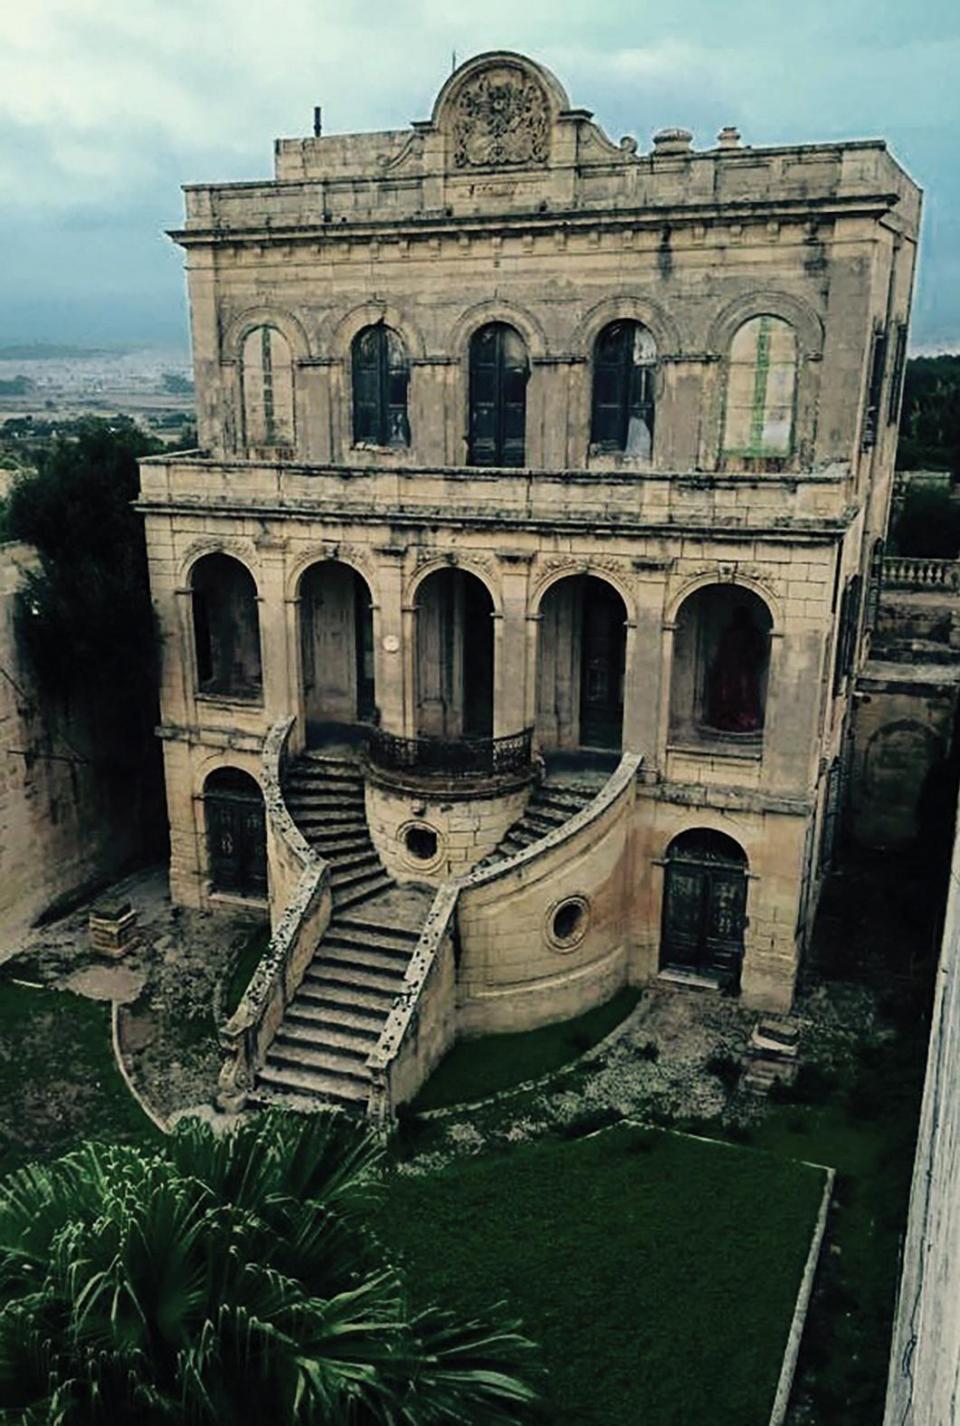 Villa Luginsland, in Rabat, the former residence of Baron von Tucher. Photo: https://malta.intercontinental.com/wp-content/uploads/2017/09/abandoned-building-in-rabat.jpg